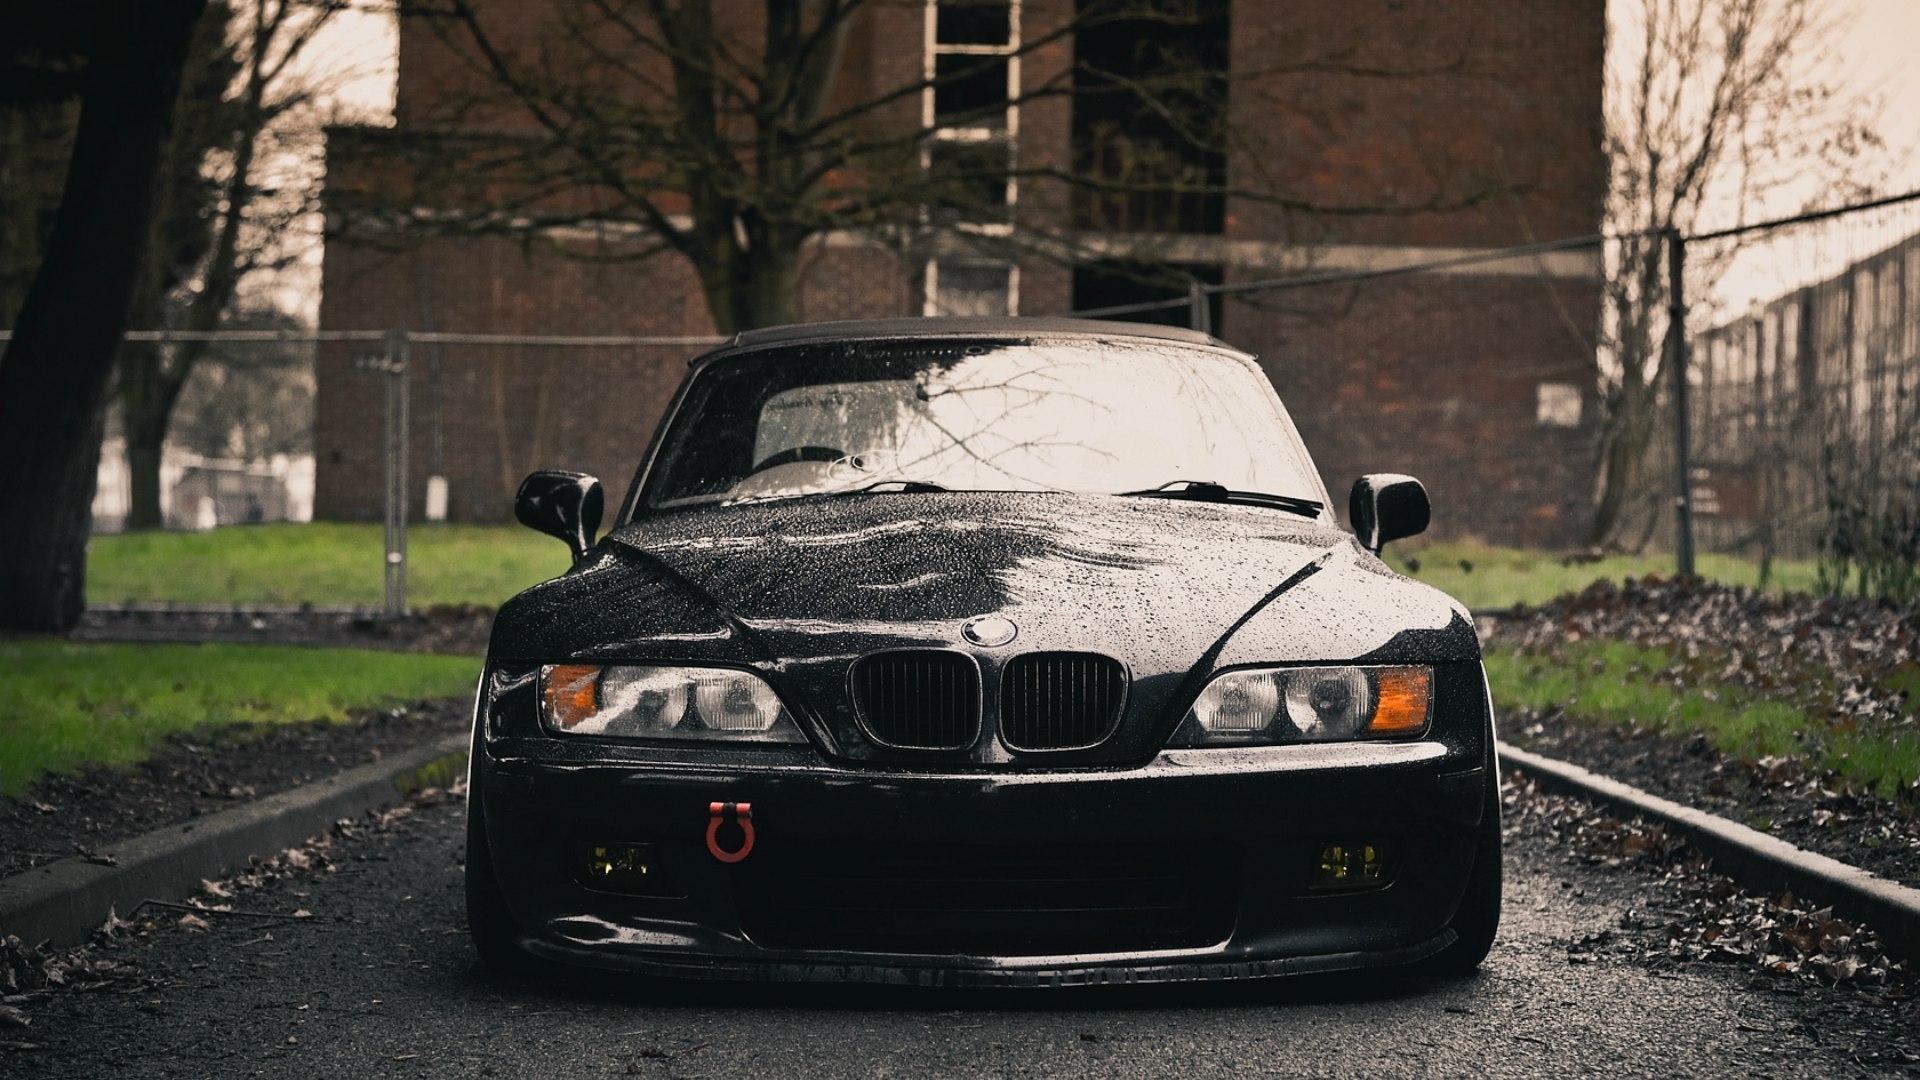 Wallpaper : BMW, Z3, black, front, wet 1920x1080 - wallup ...